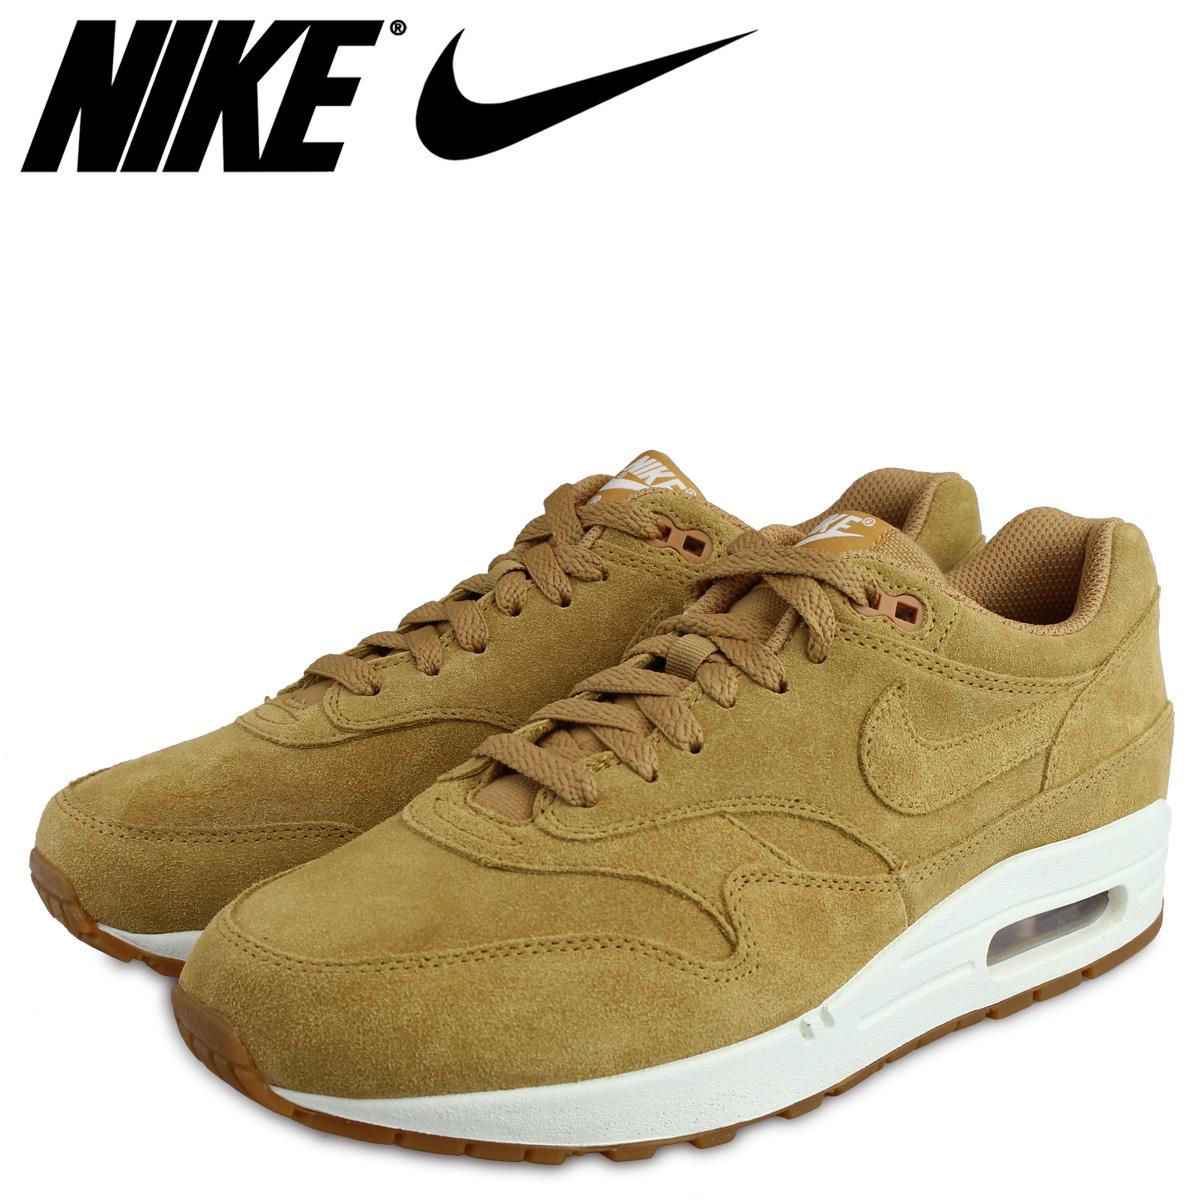 NIKE Kie Ney AMAX 1 premium sneakers AIR MAX 1 PREMIUM WHEAT 875,844 203 men's shoes light brown